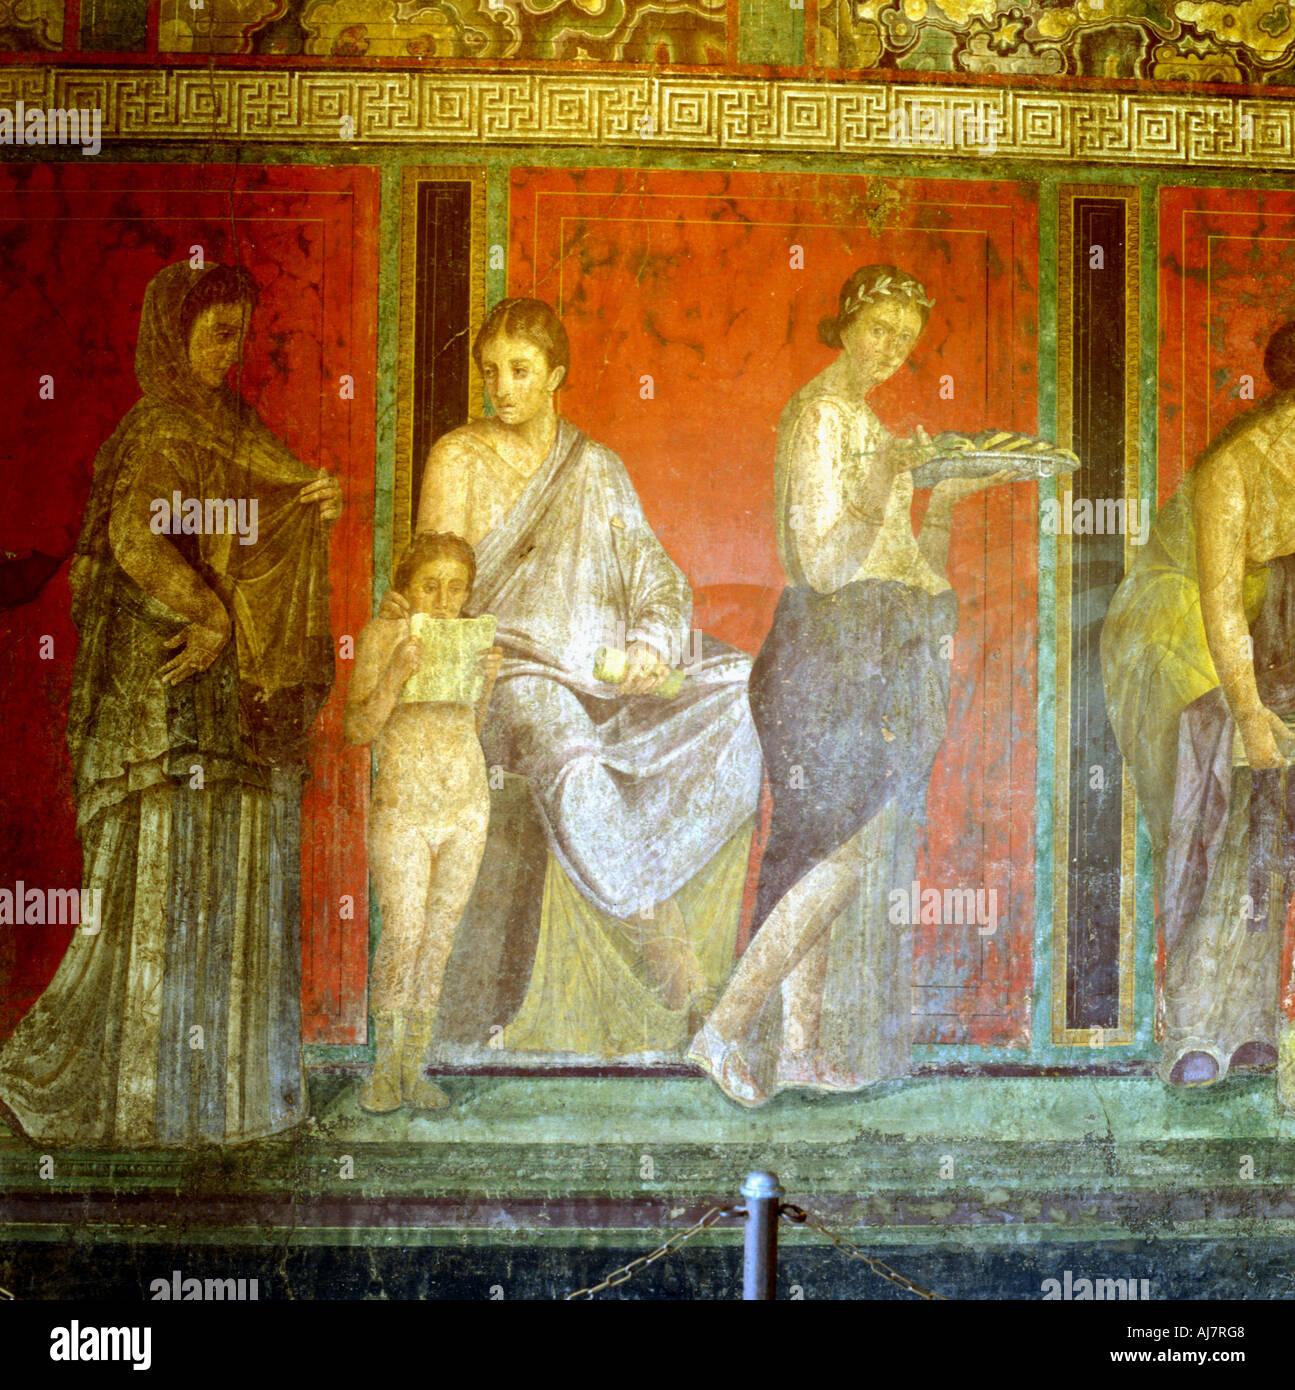 Fresco from the Villa of the Mysteries Pompeii Italy c1st century BC 1st century AD  - Stock Image